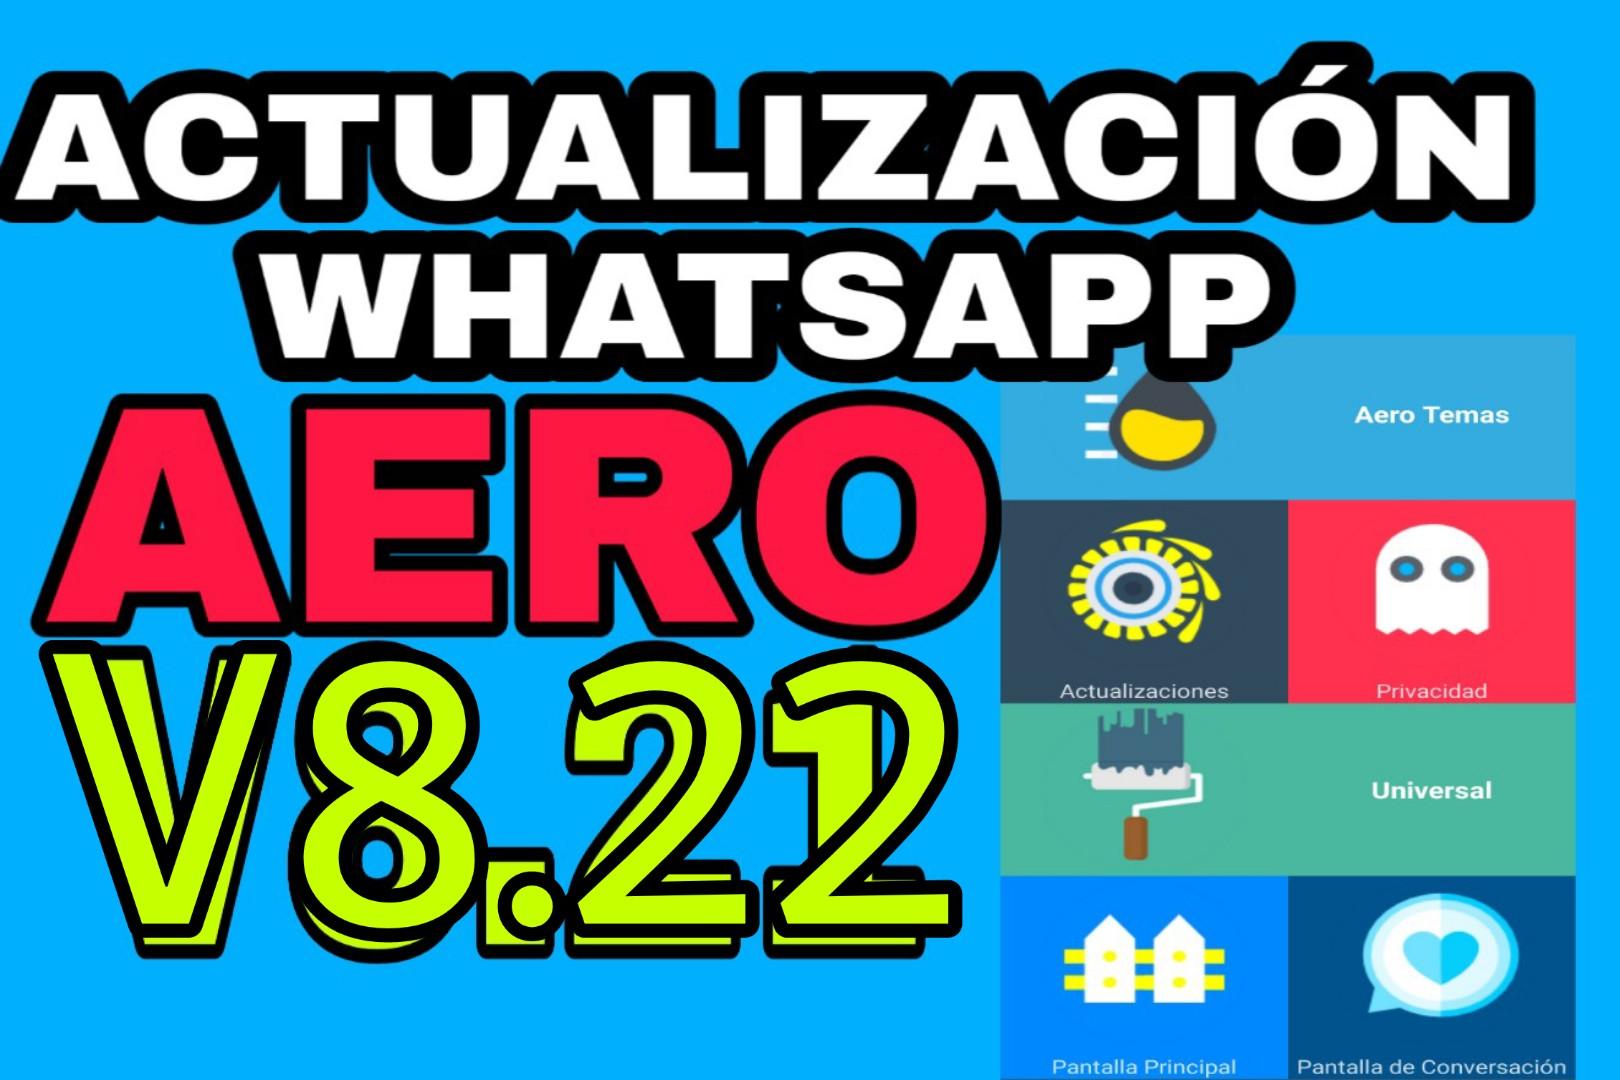 Download WhatsApp Aero 8.22